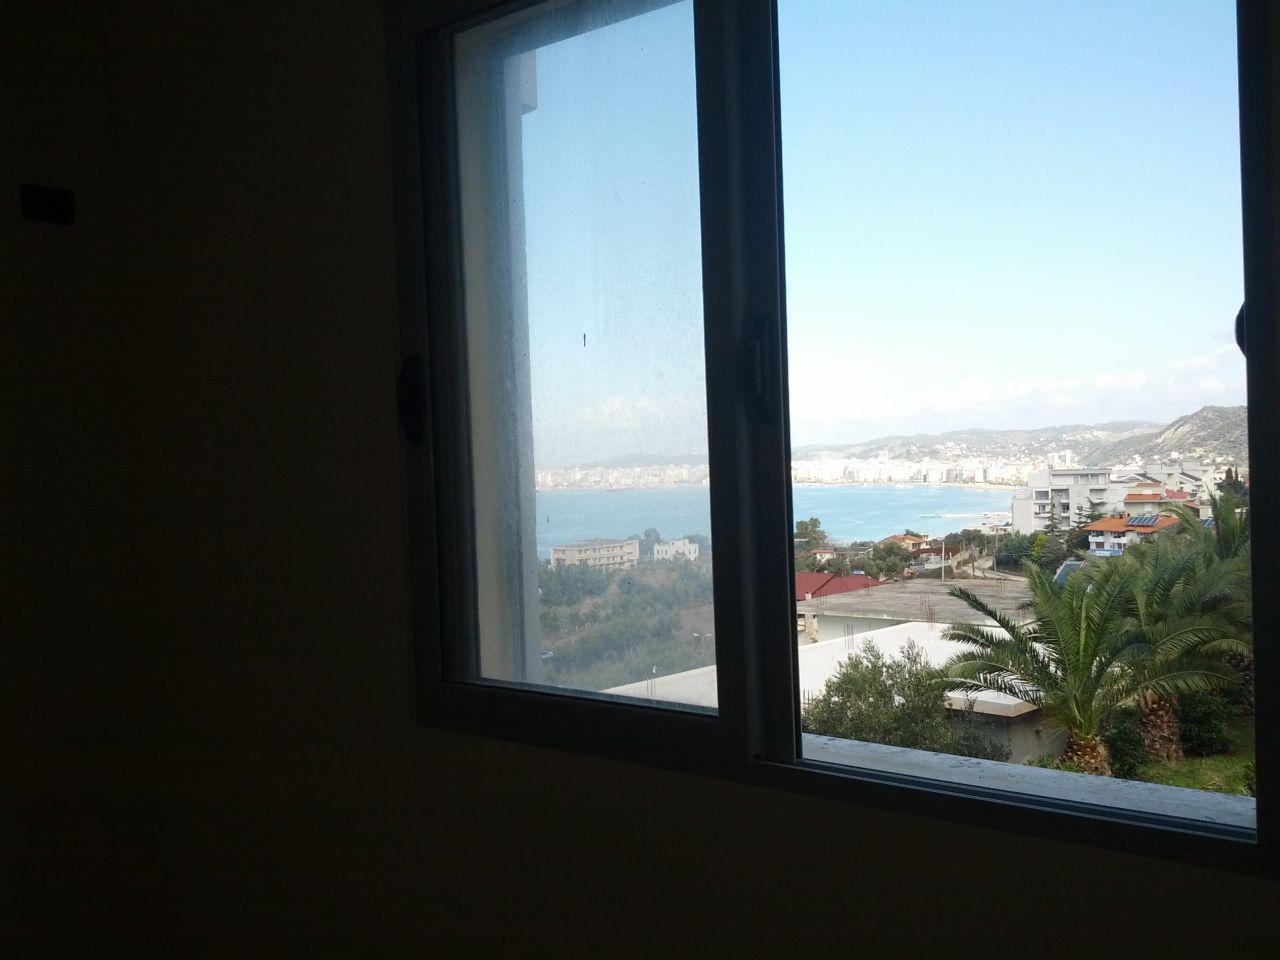 Price 44200 EURO - Apartment for Sale – 65 m²